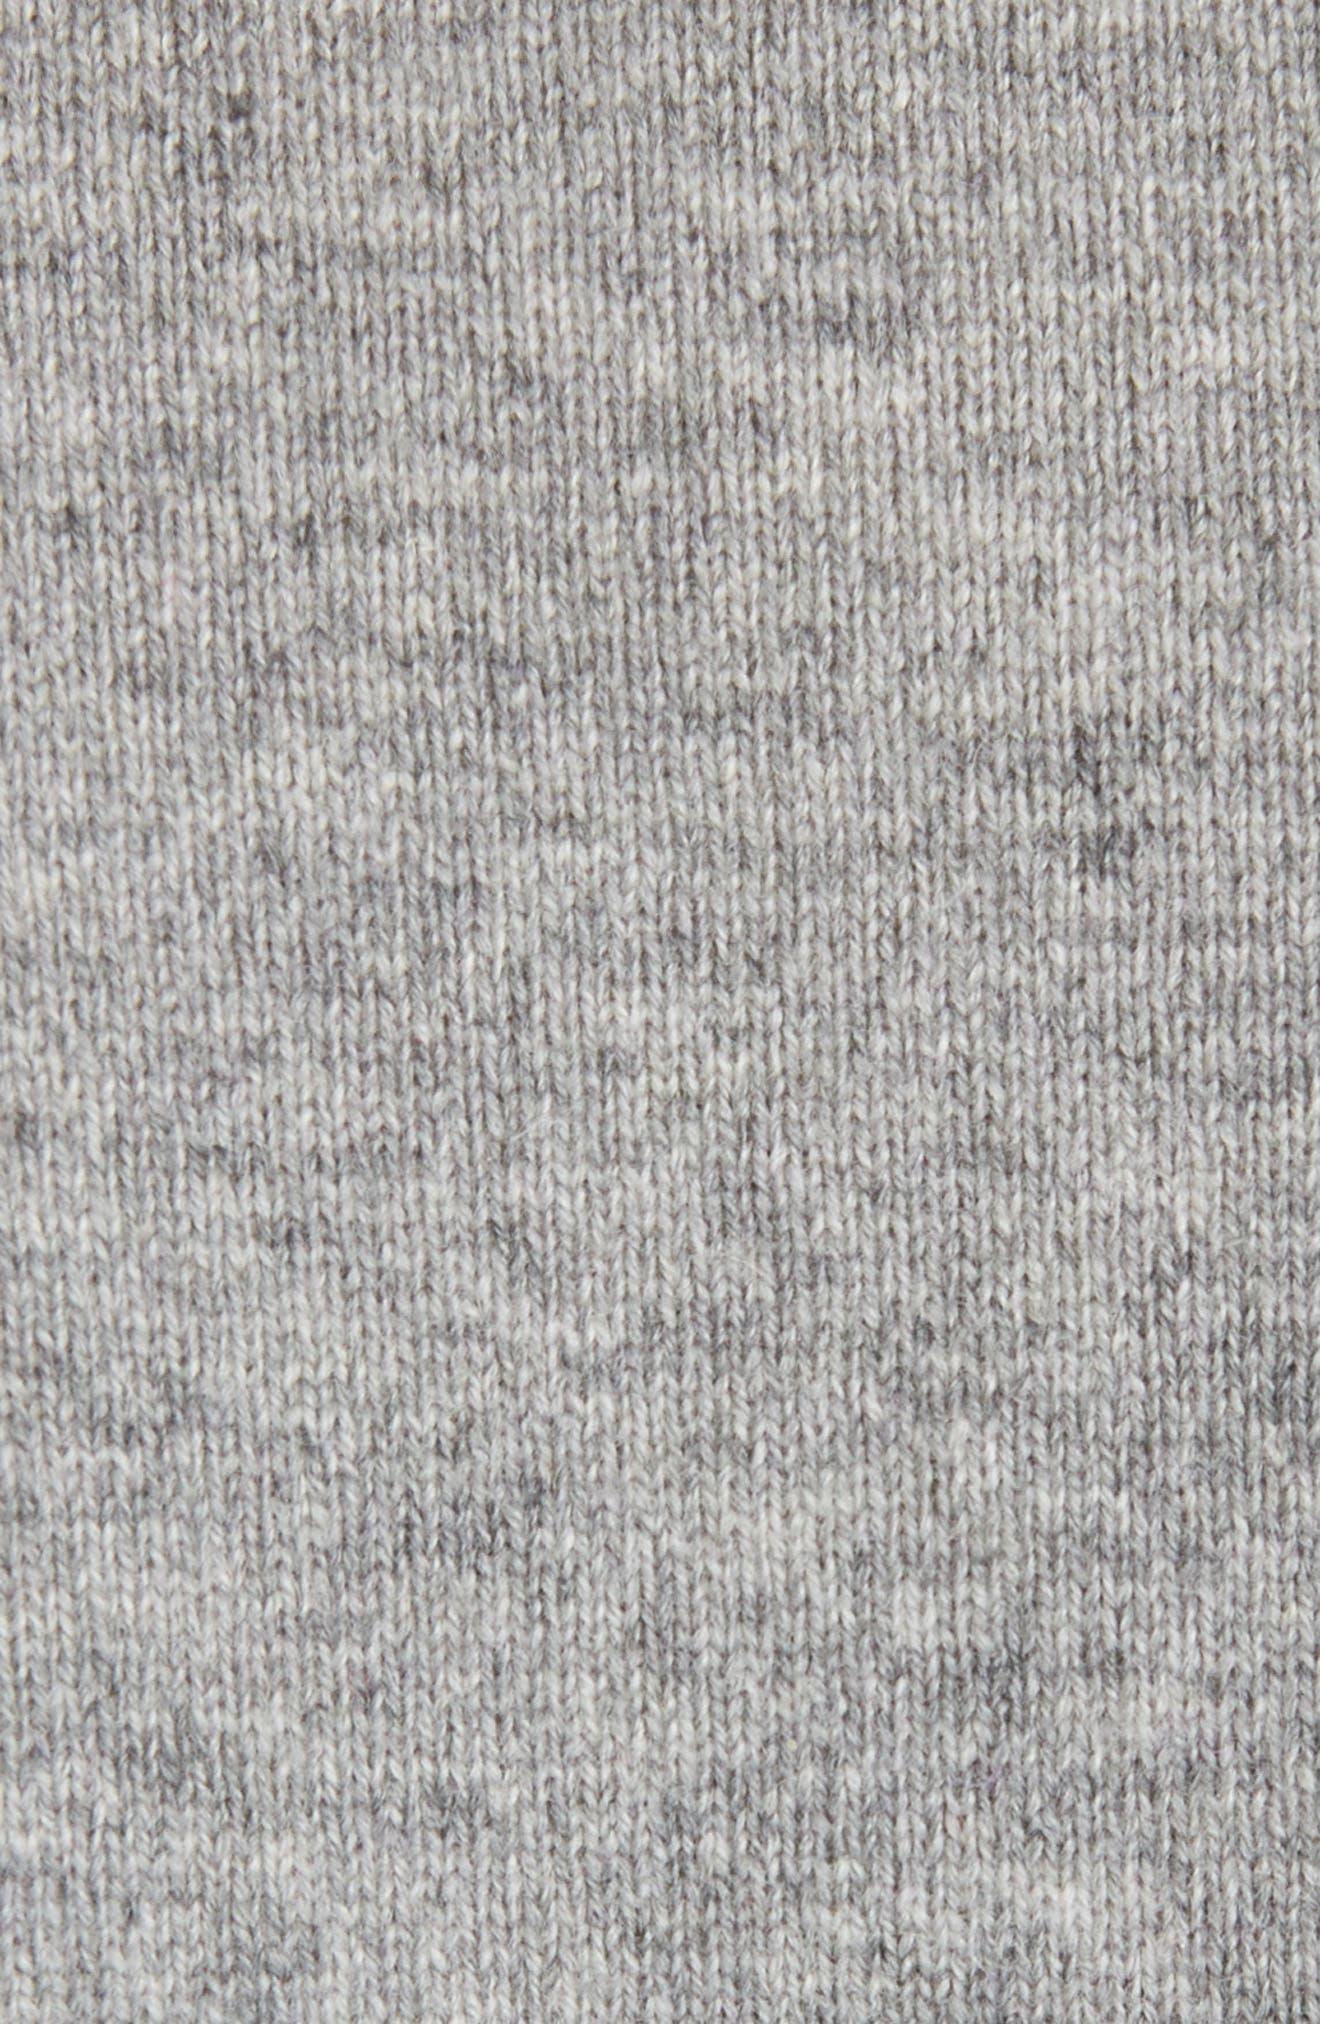 Shredded Logo Cashmere Sweater,                             Alternate thumbnail 5, color,                             GREY